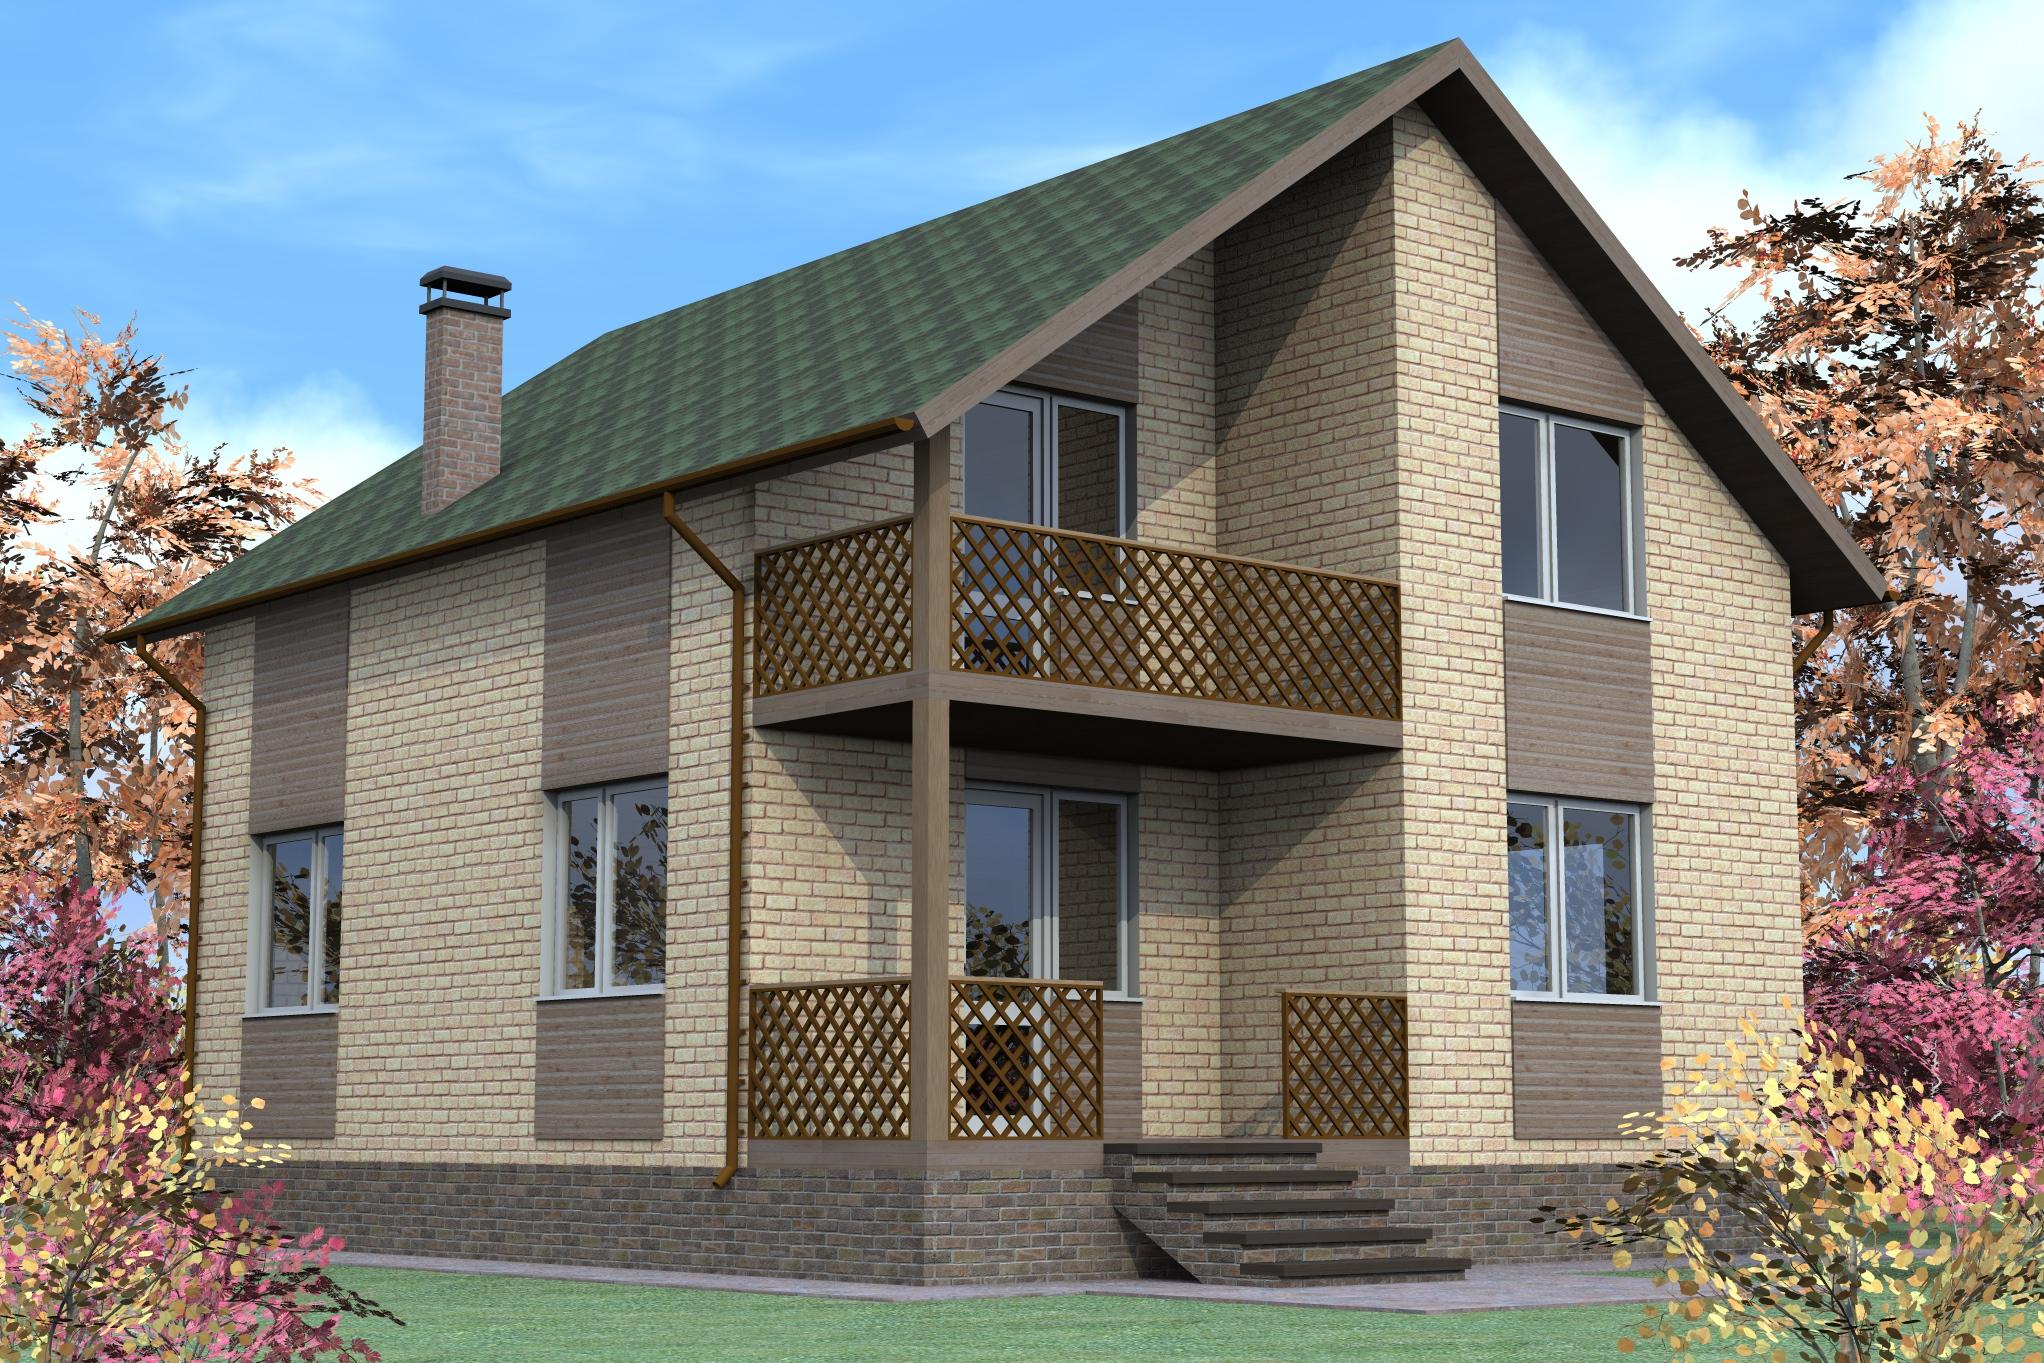 Дом бетон кирпич фиброволокно в бетон